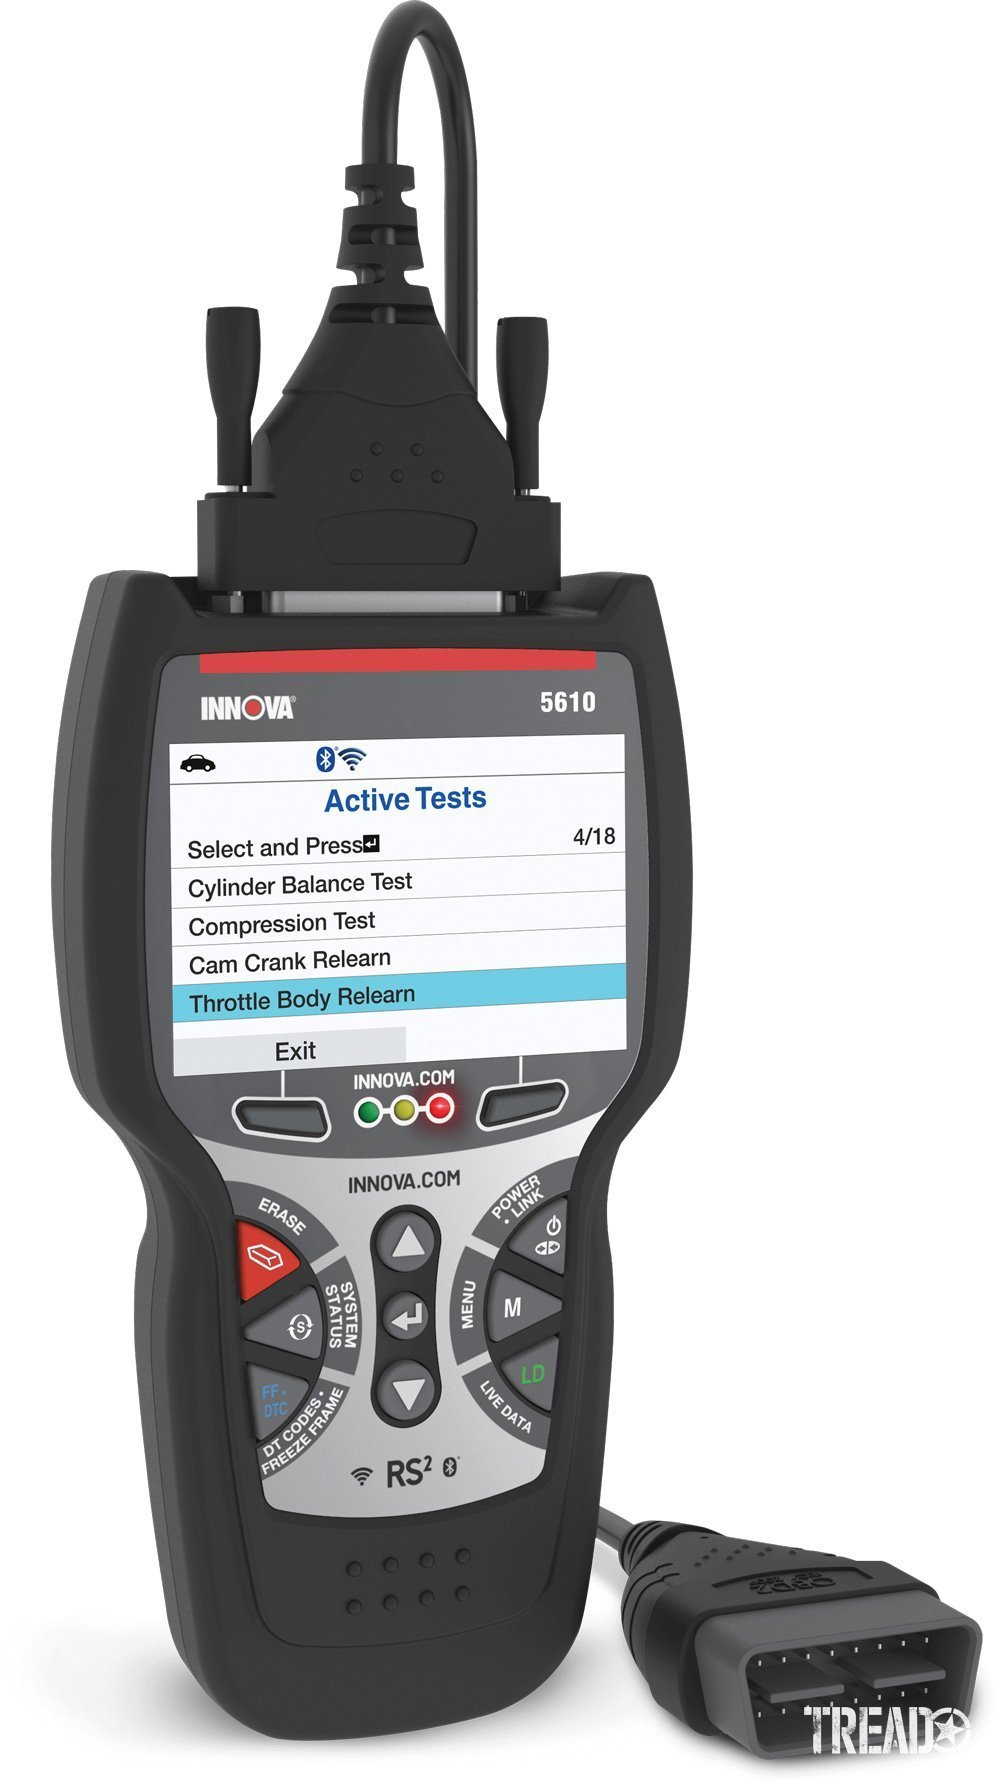 Innova/CarScan Pro 5610